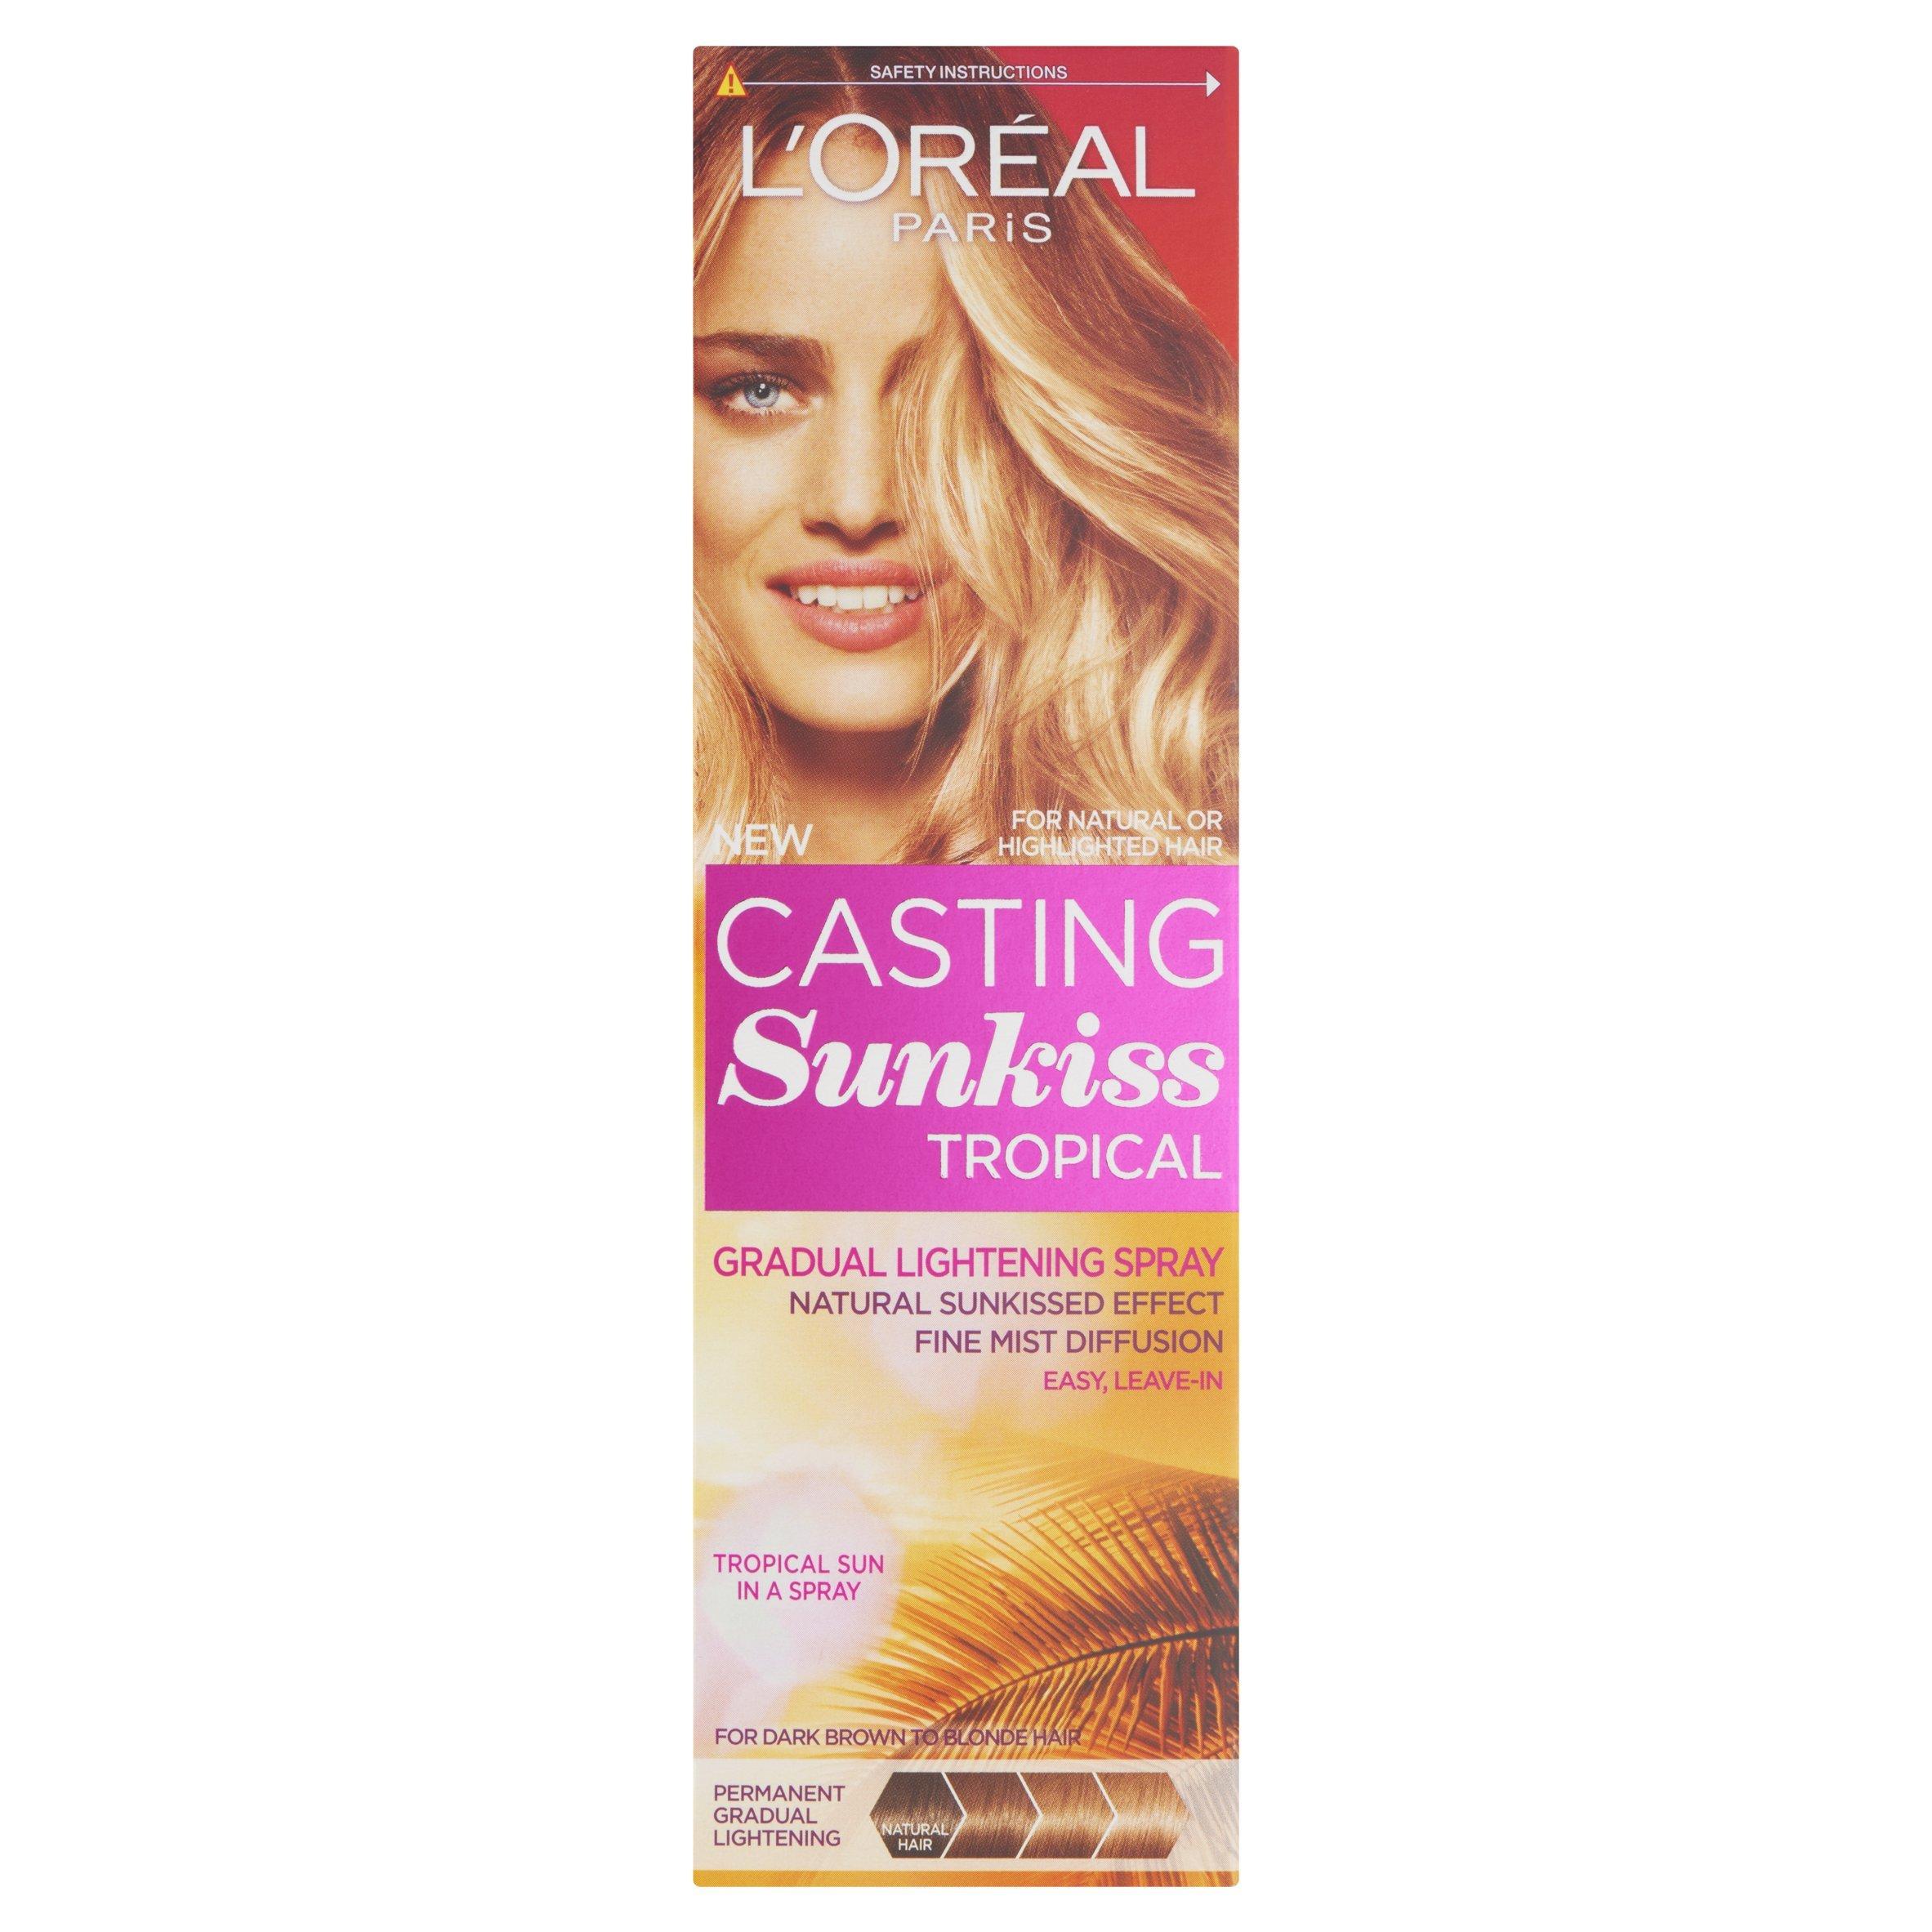 L'Oreal Paris Casting Sunkiss Tropical Intense Lightening Spray